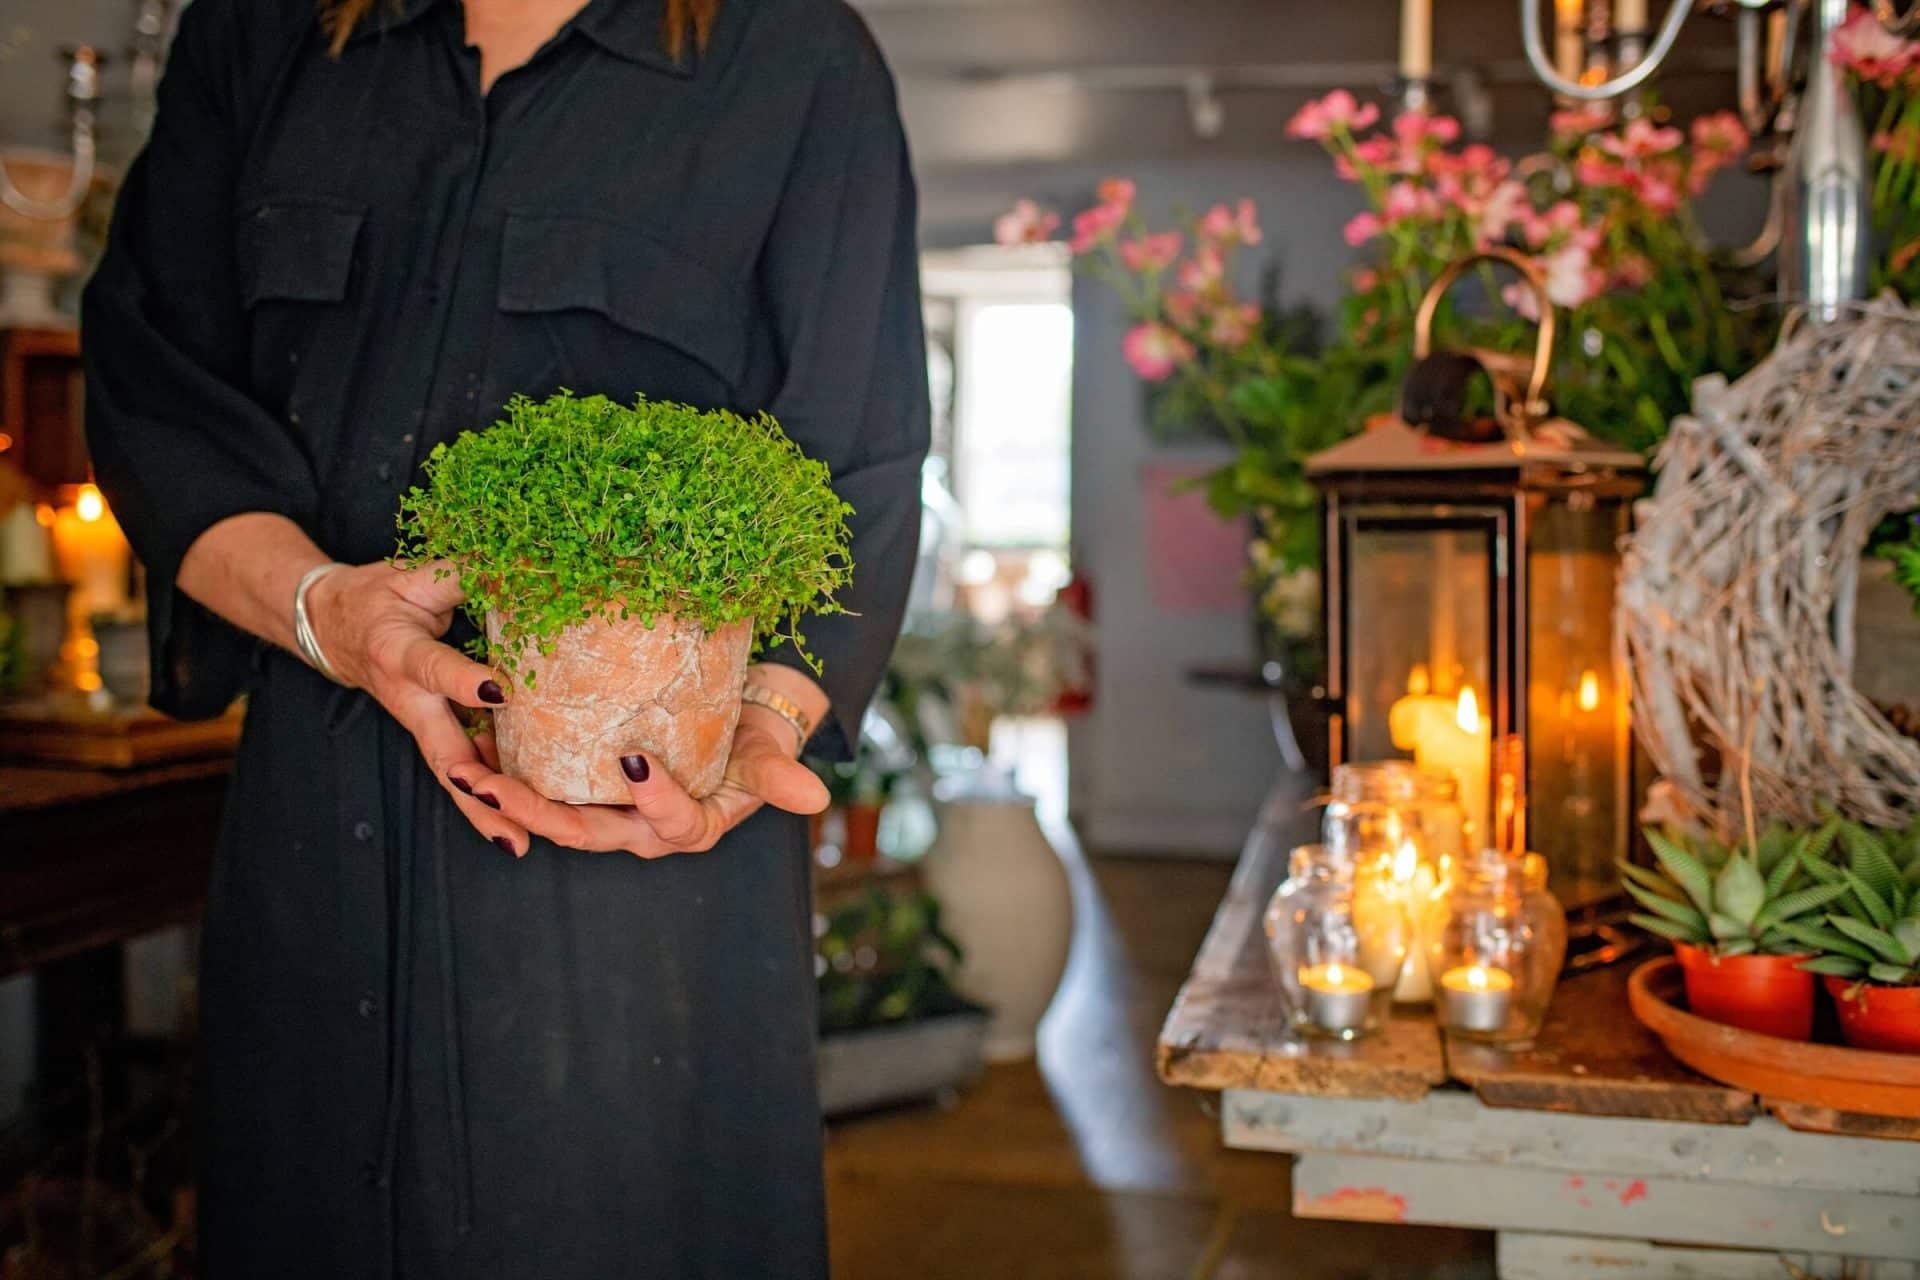 Florist holding green plant